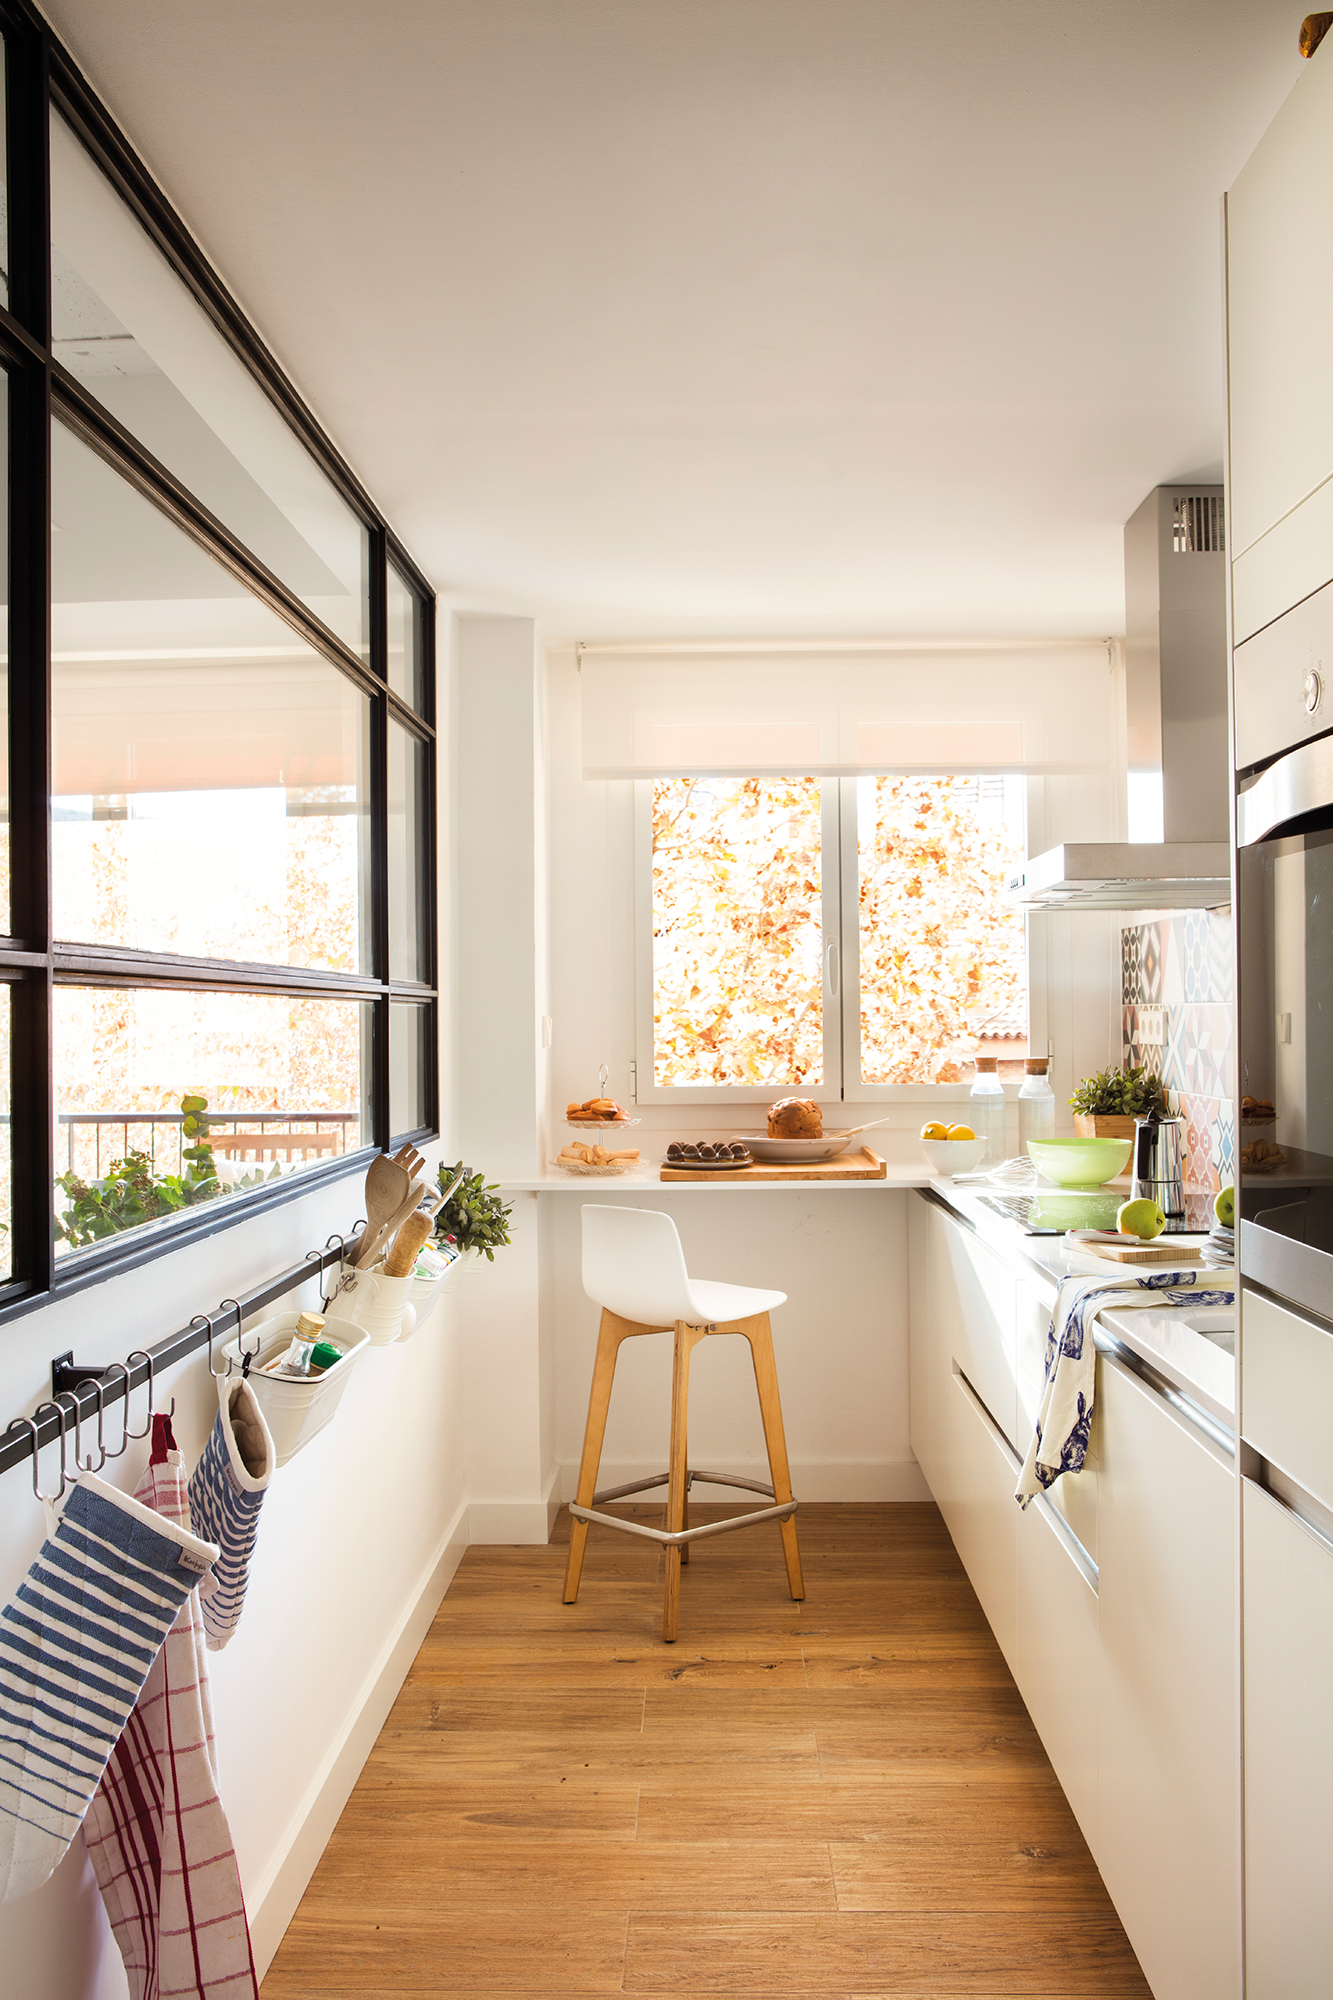 Cocinas peque as en un solo frente for Cocina con barra de retorno